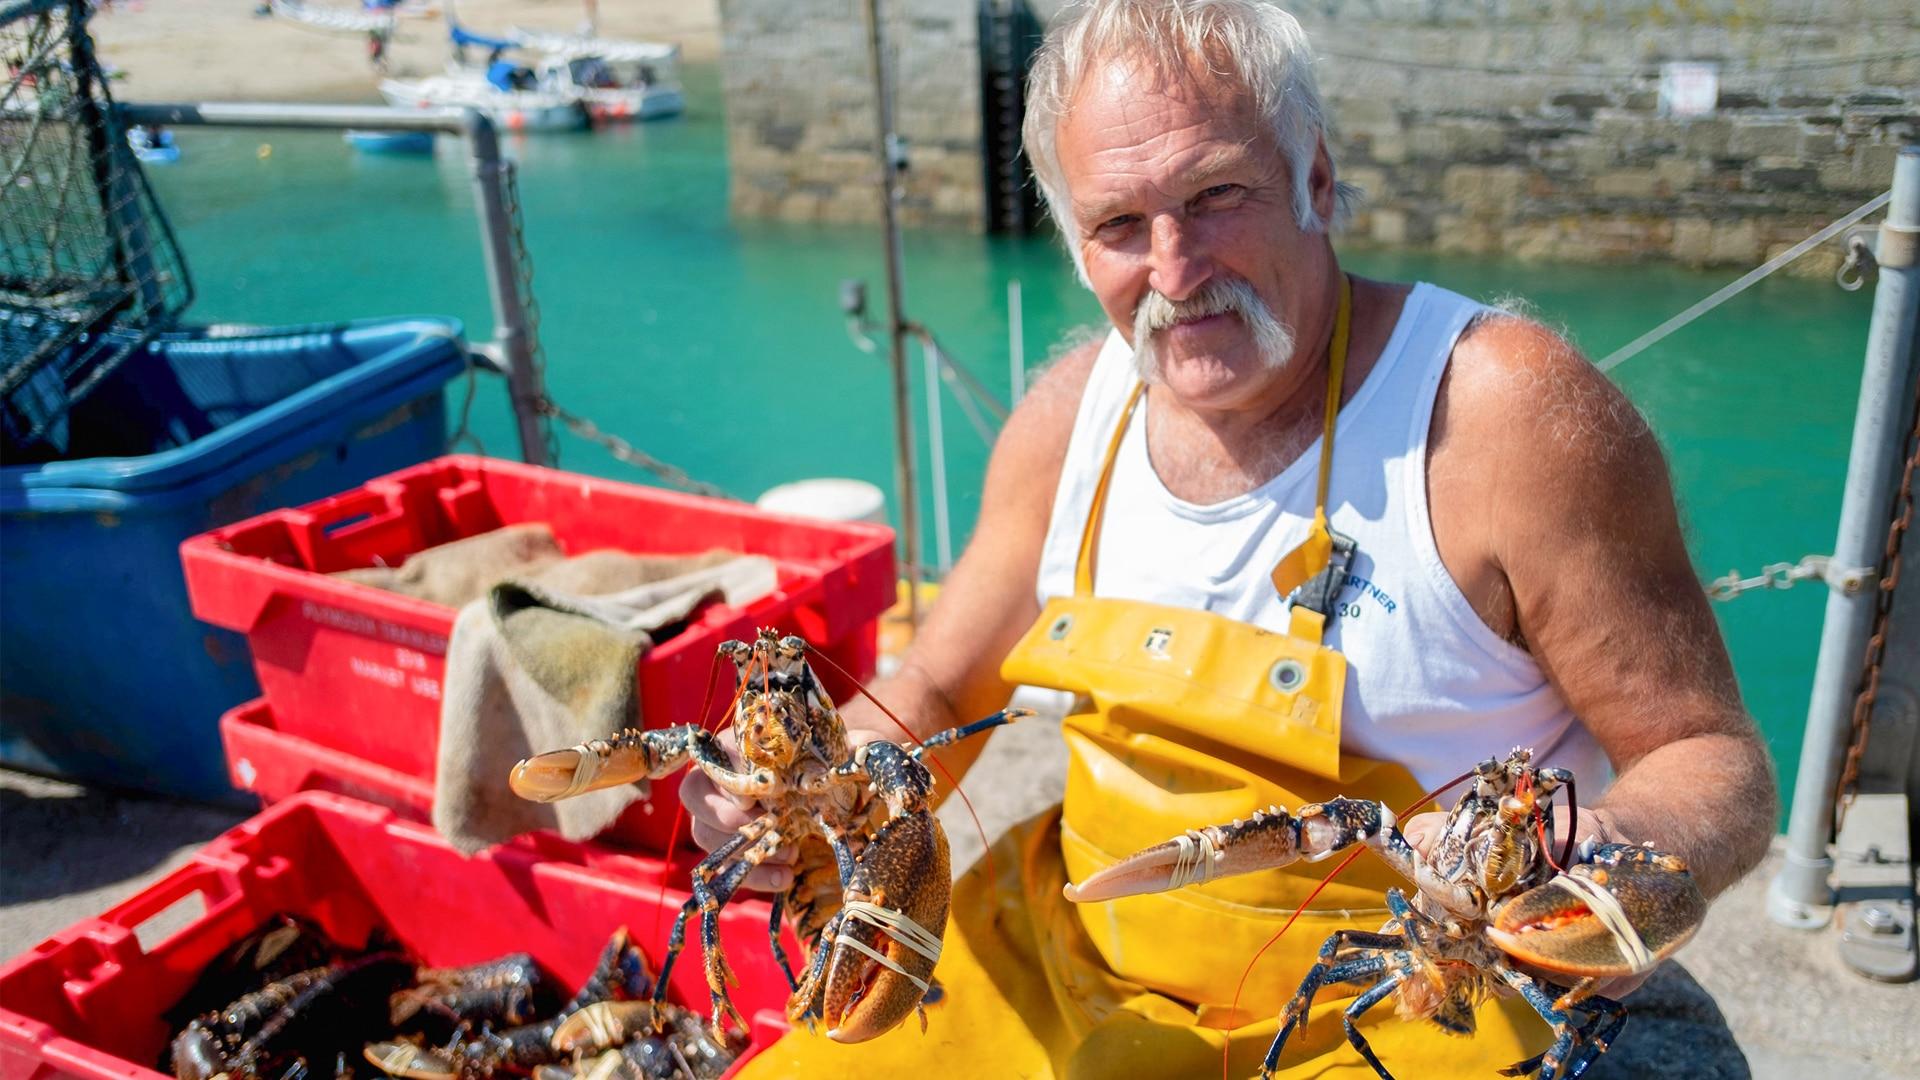 Fisherman on Devon & Cornwall TV programme